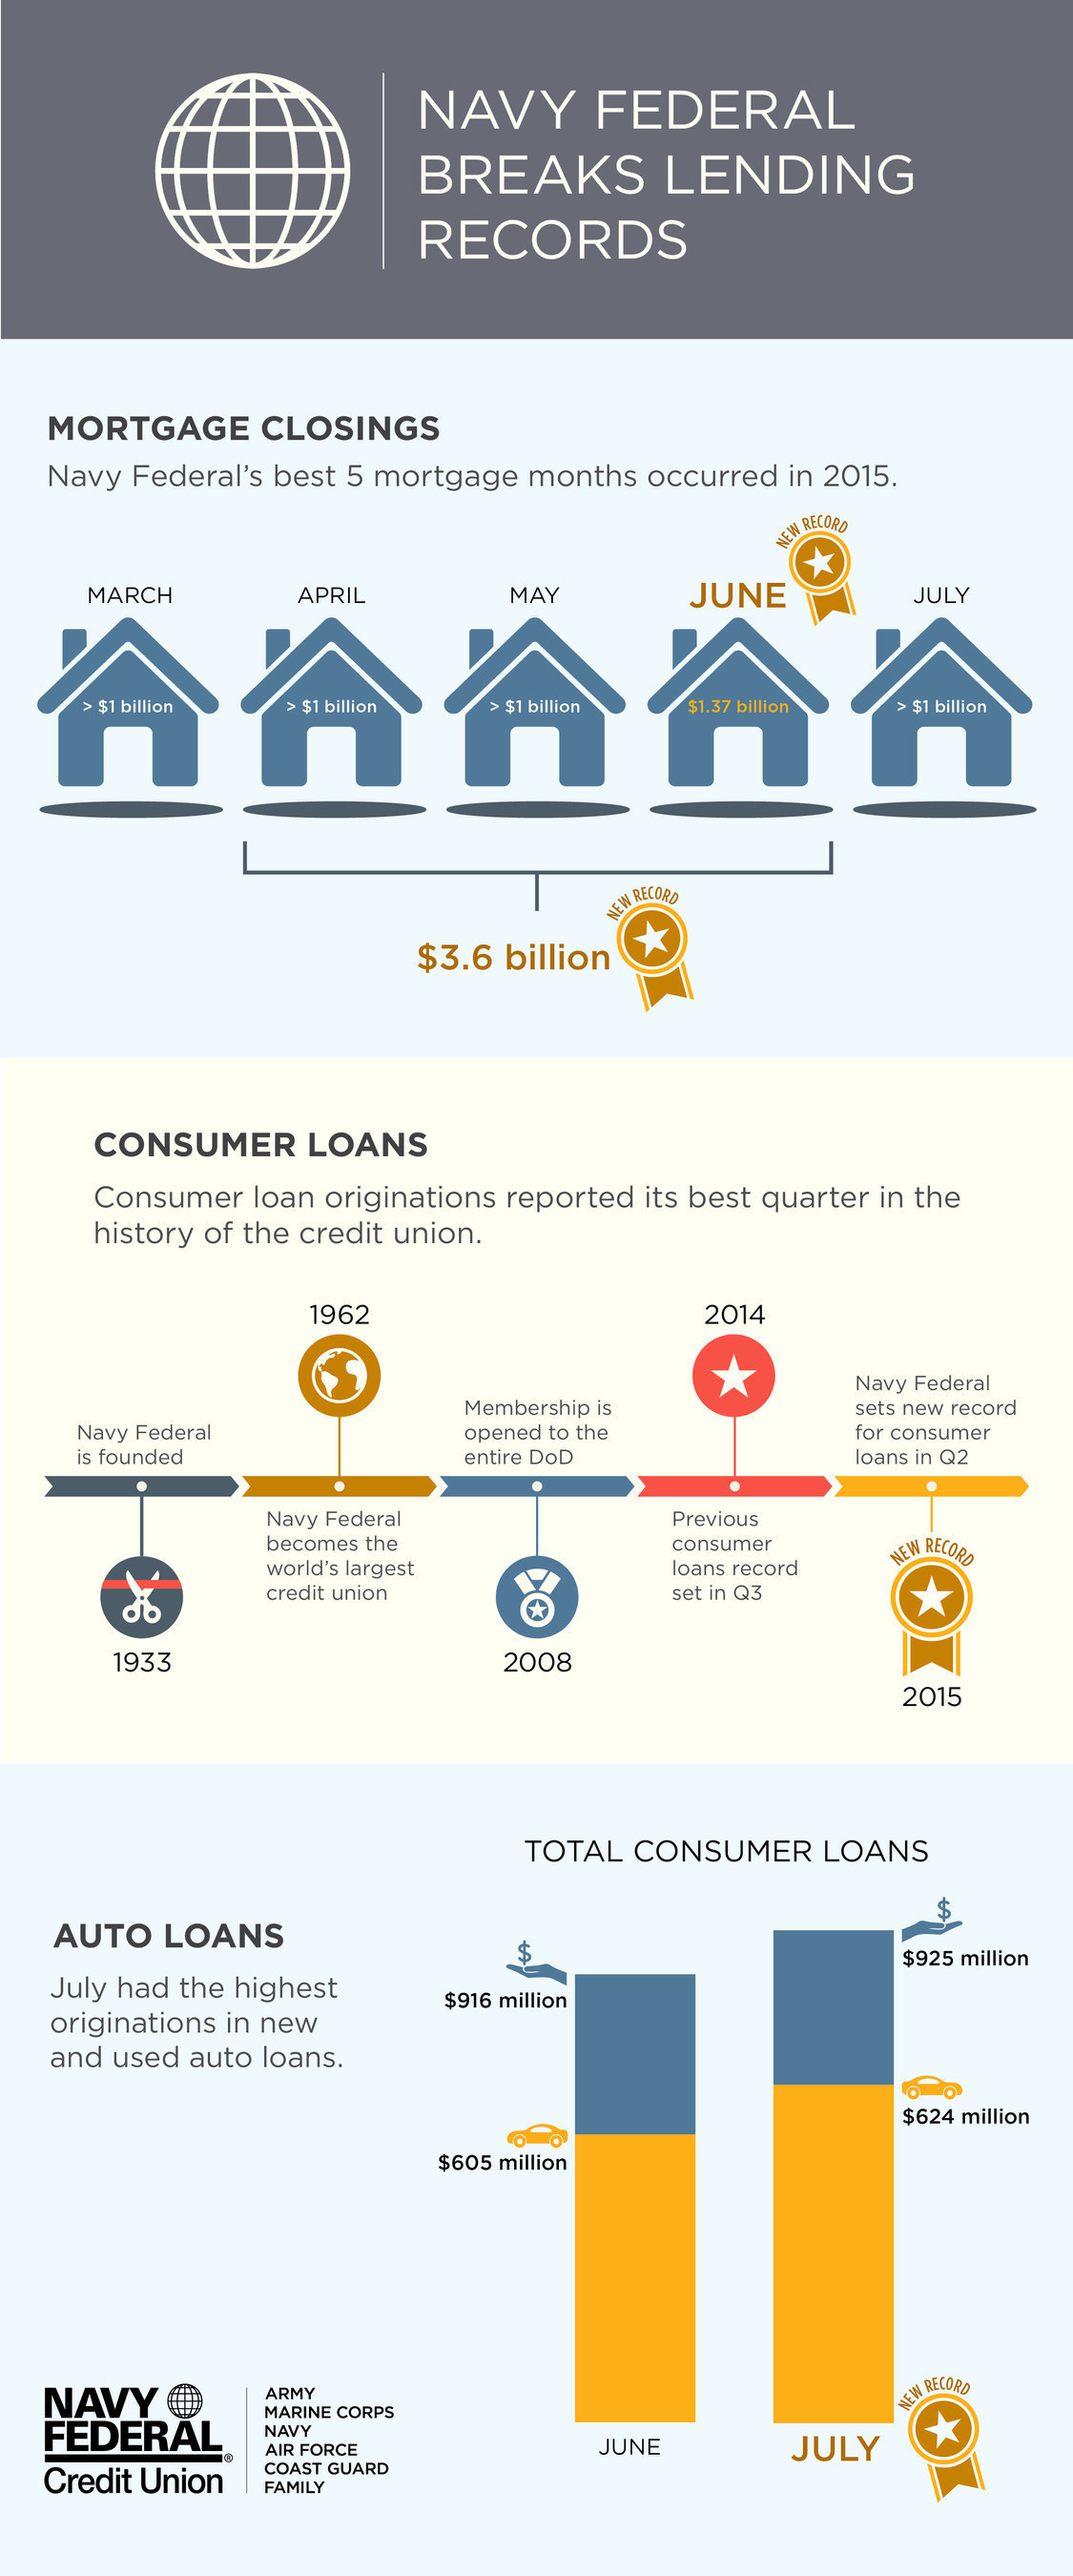 Navy Federal breaks lending records